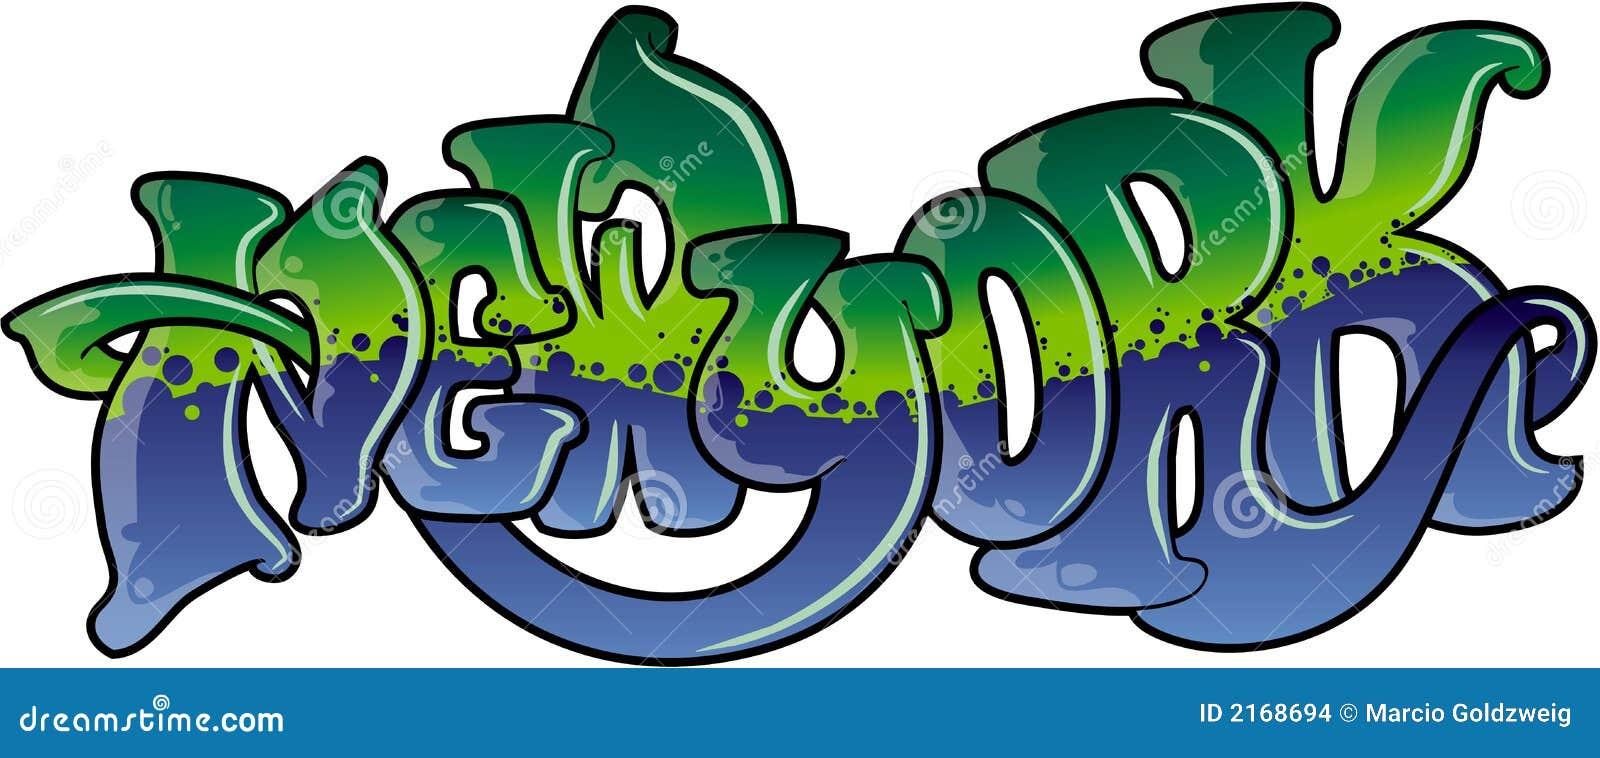 New York style graffiti paint.